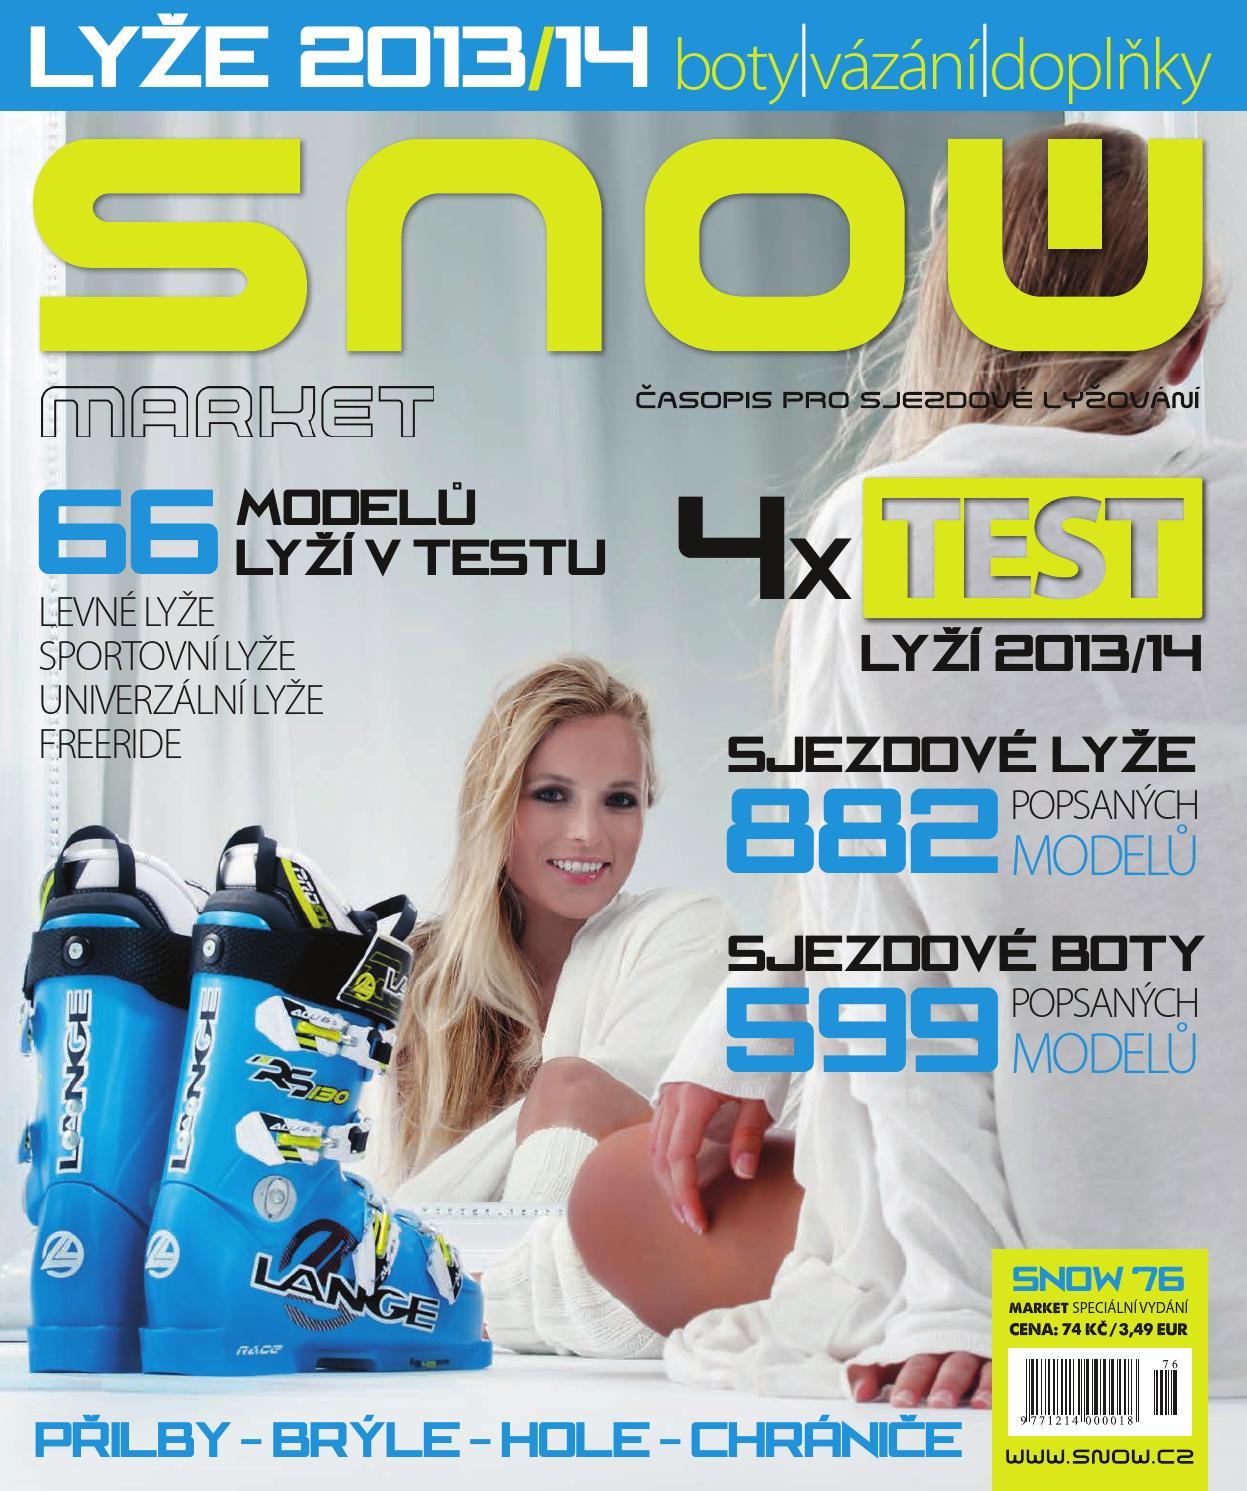 SNOW 76 Market - lyže a testy lyží 2013 2014 by SNOW CZ s.r.o. - issuu f9adb7f735